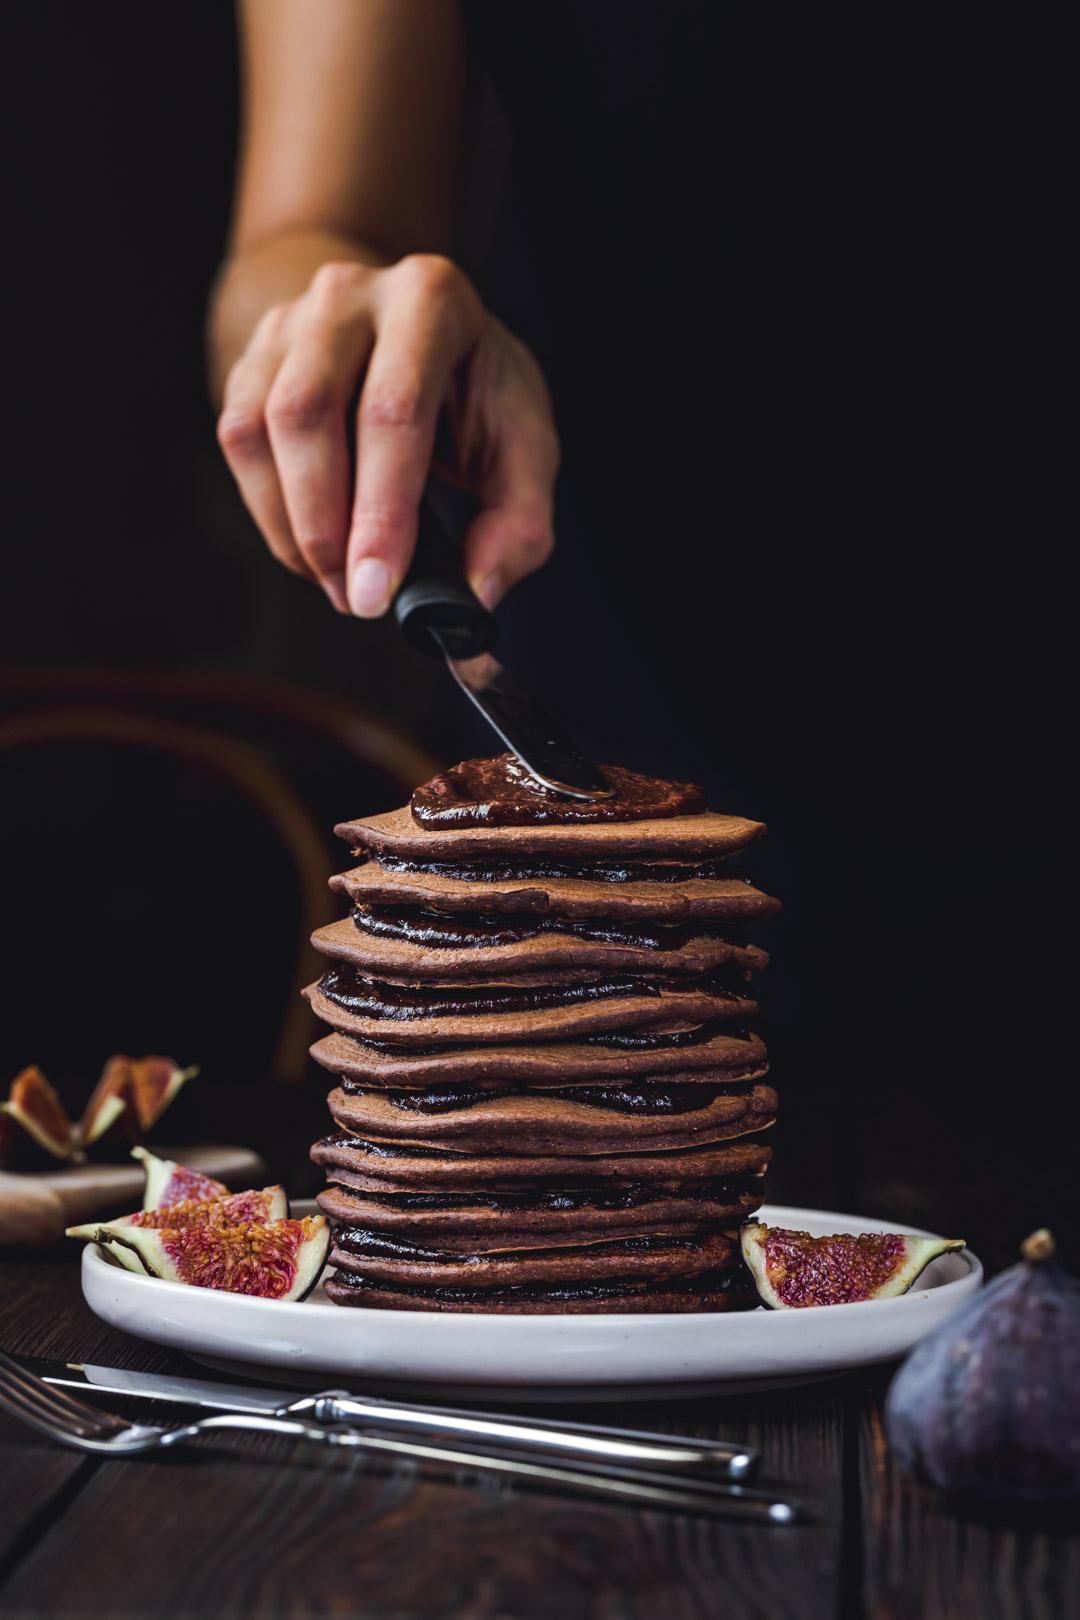 Vegan Gluten-free Chocolate Pancakes